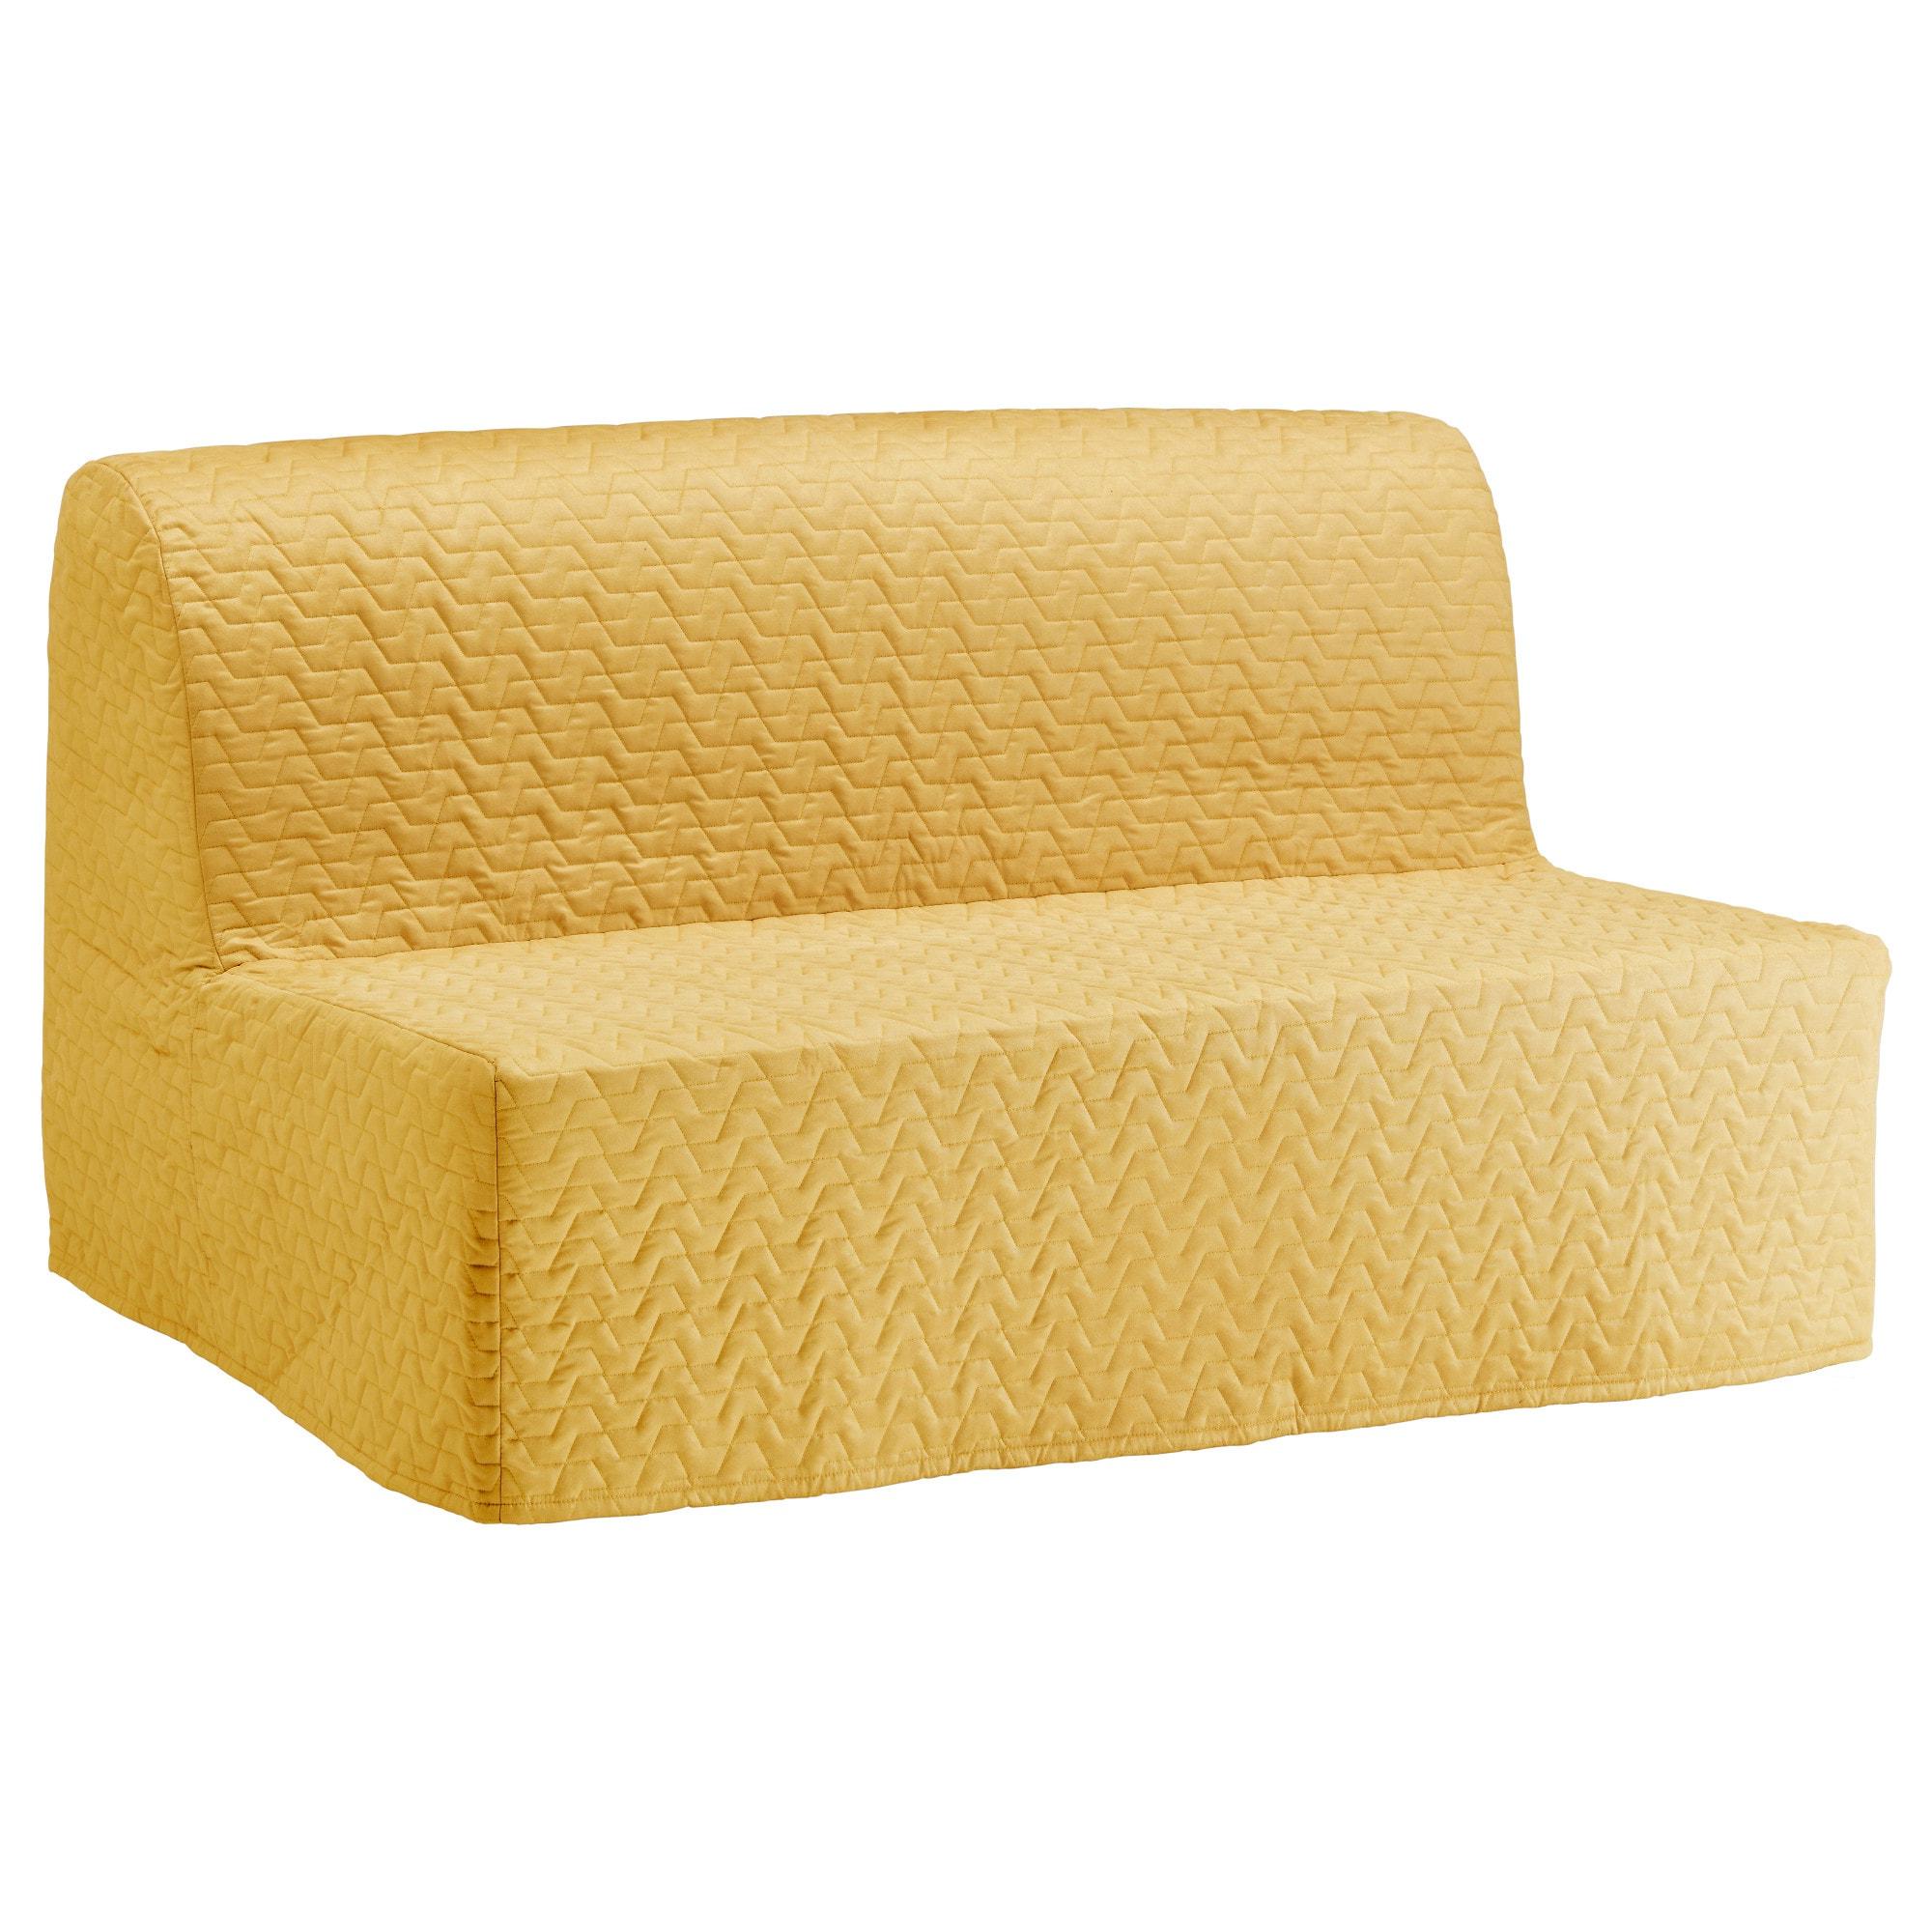 Sofa Cama Dos Plazas Etdg Lycksele Hà Vet sofà Cama 2 Plazas Vallarum Amarillo Ikea